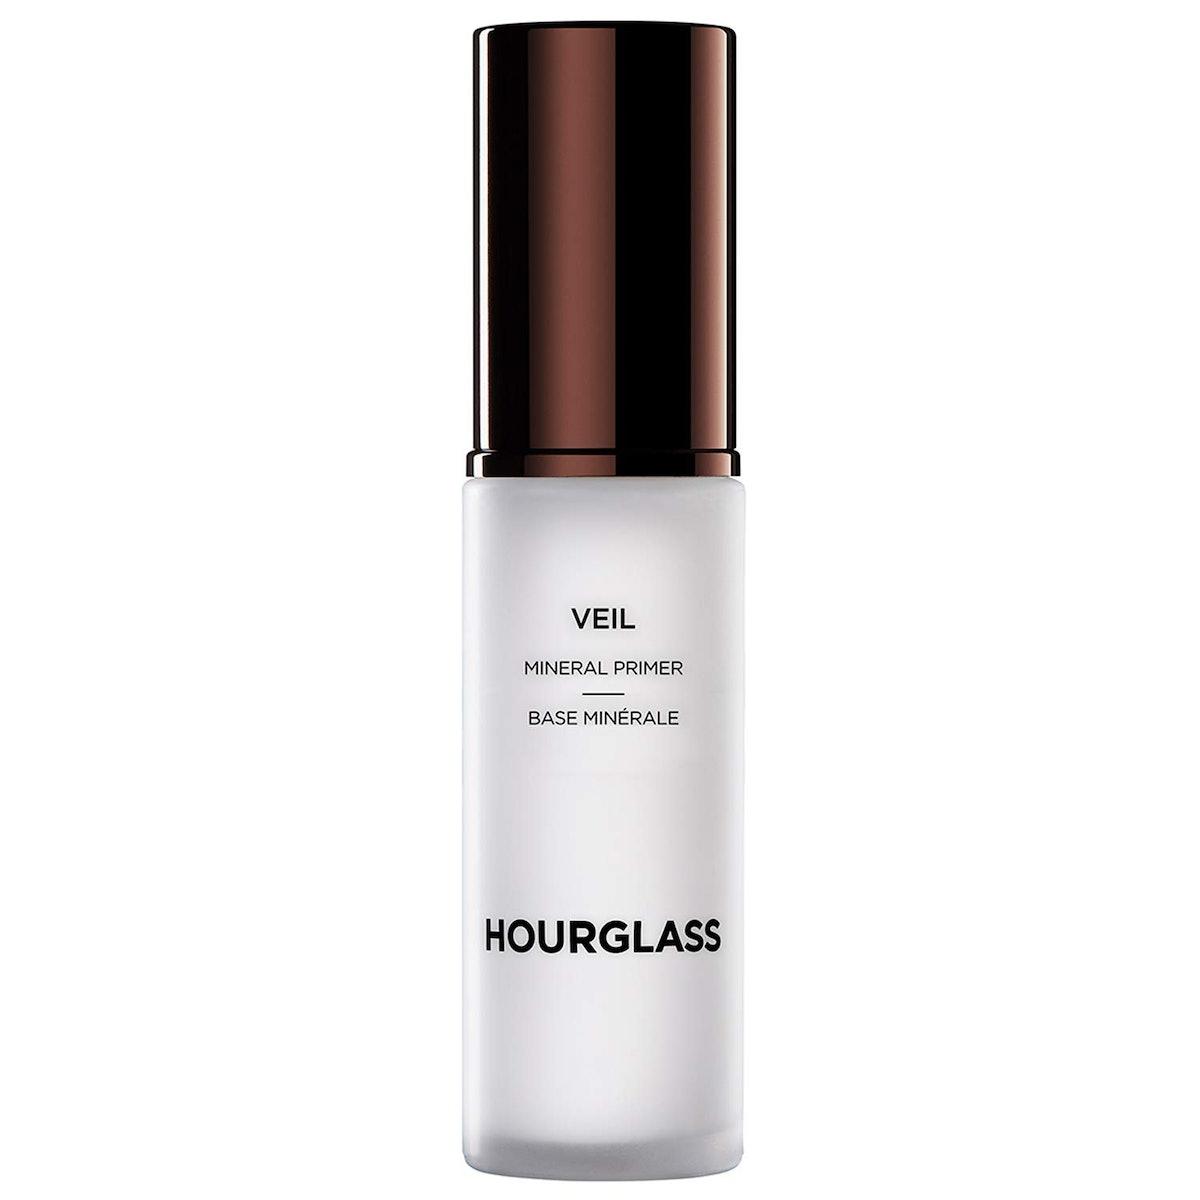 Hourglass Veil Mineral Primer Oil-Free SPF 15